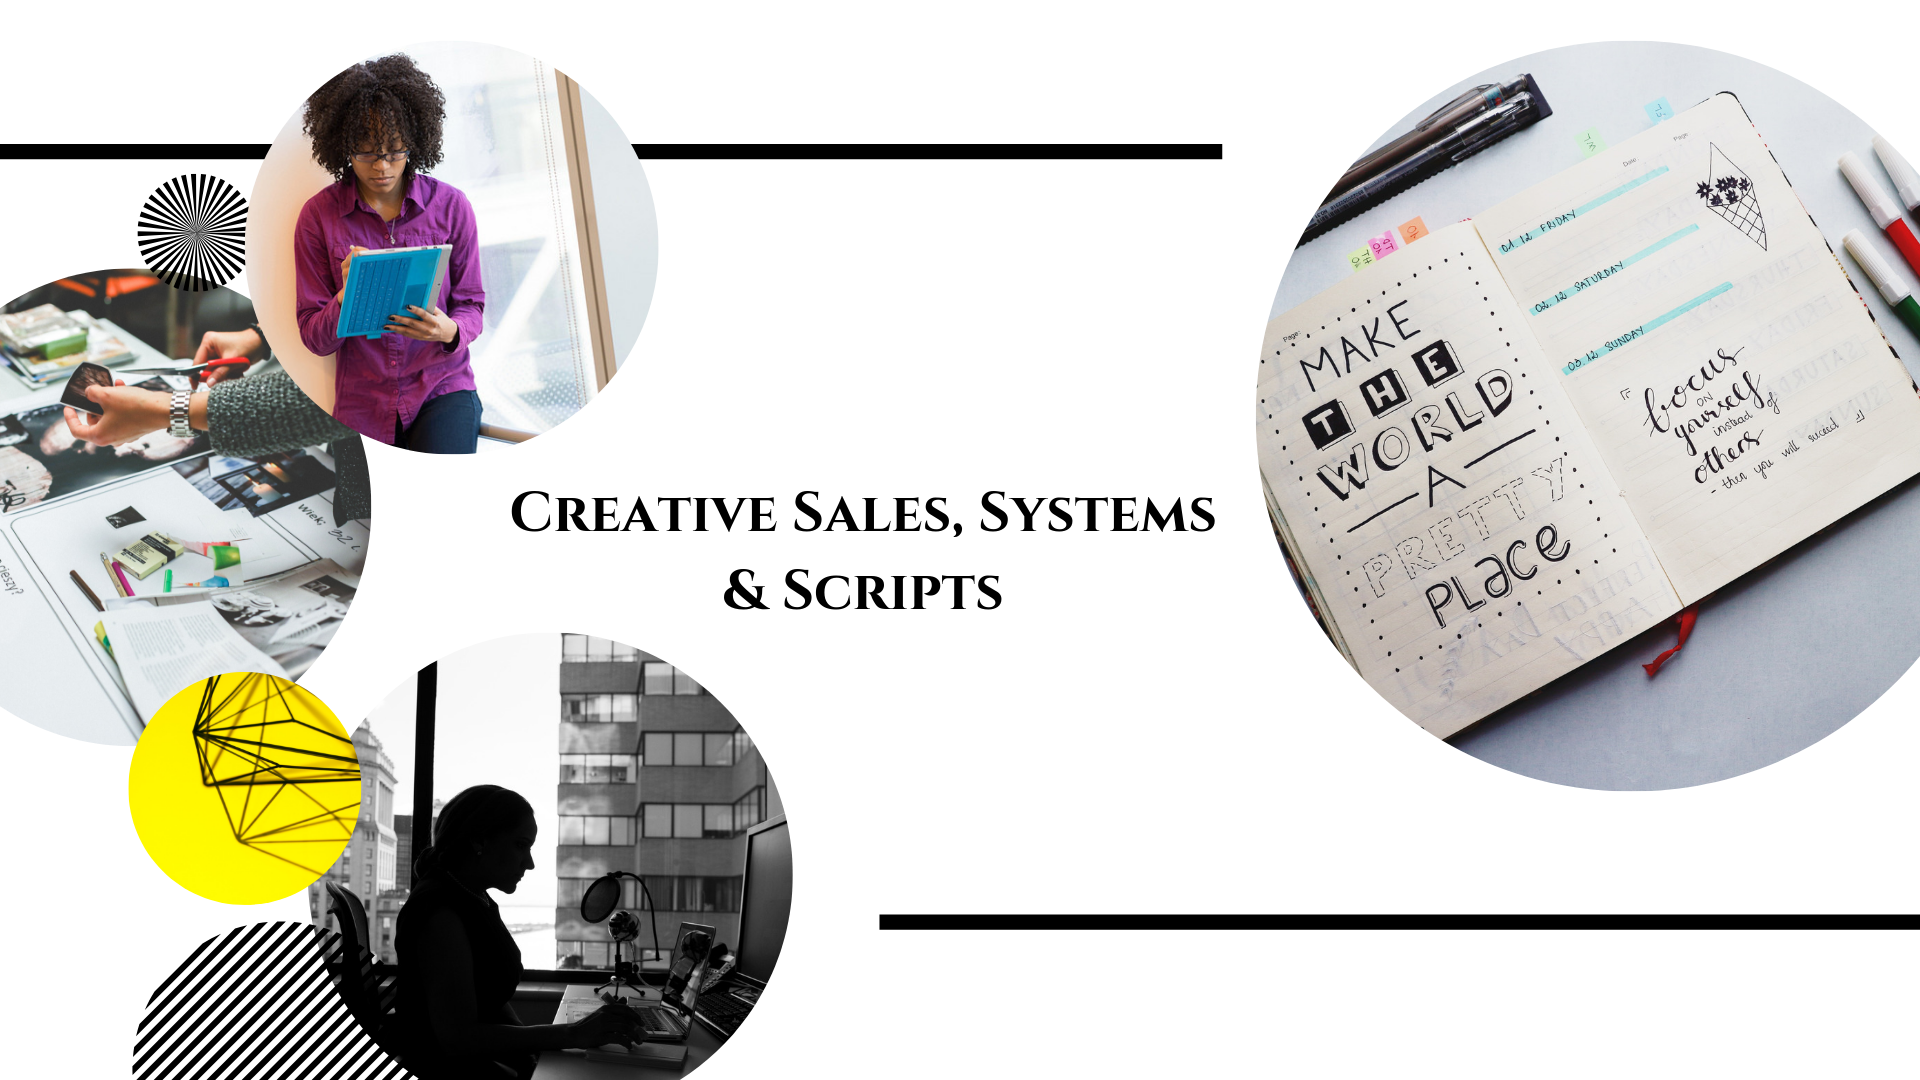 Creative SSS Header Image.png